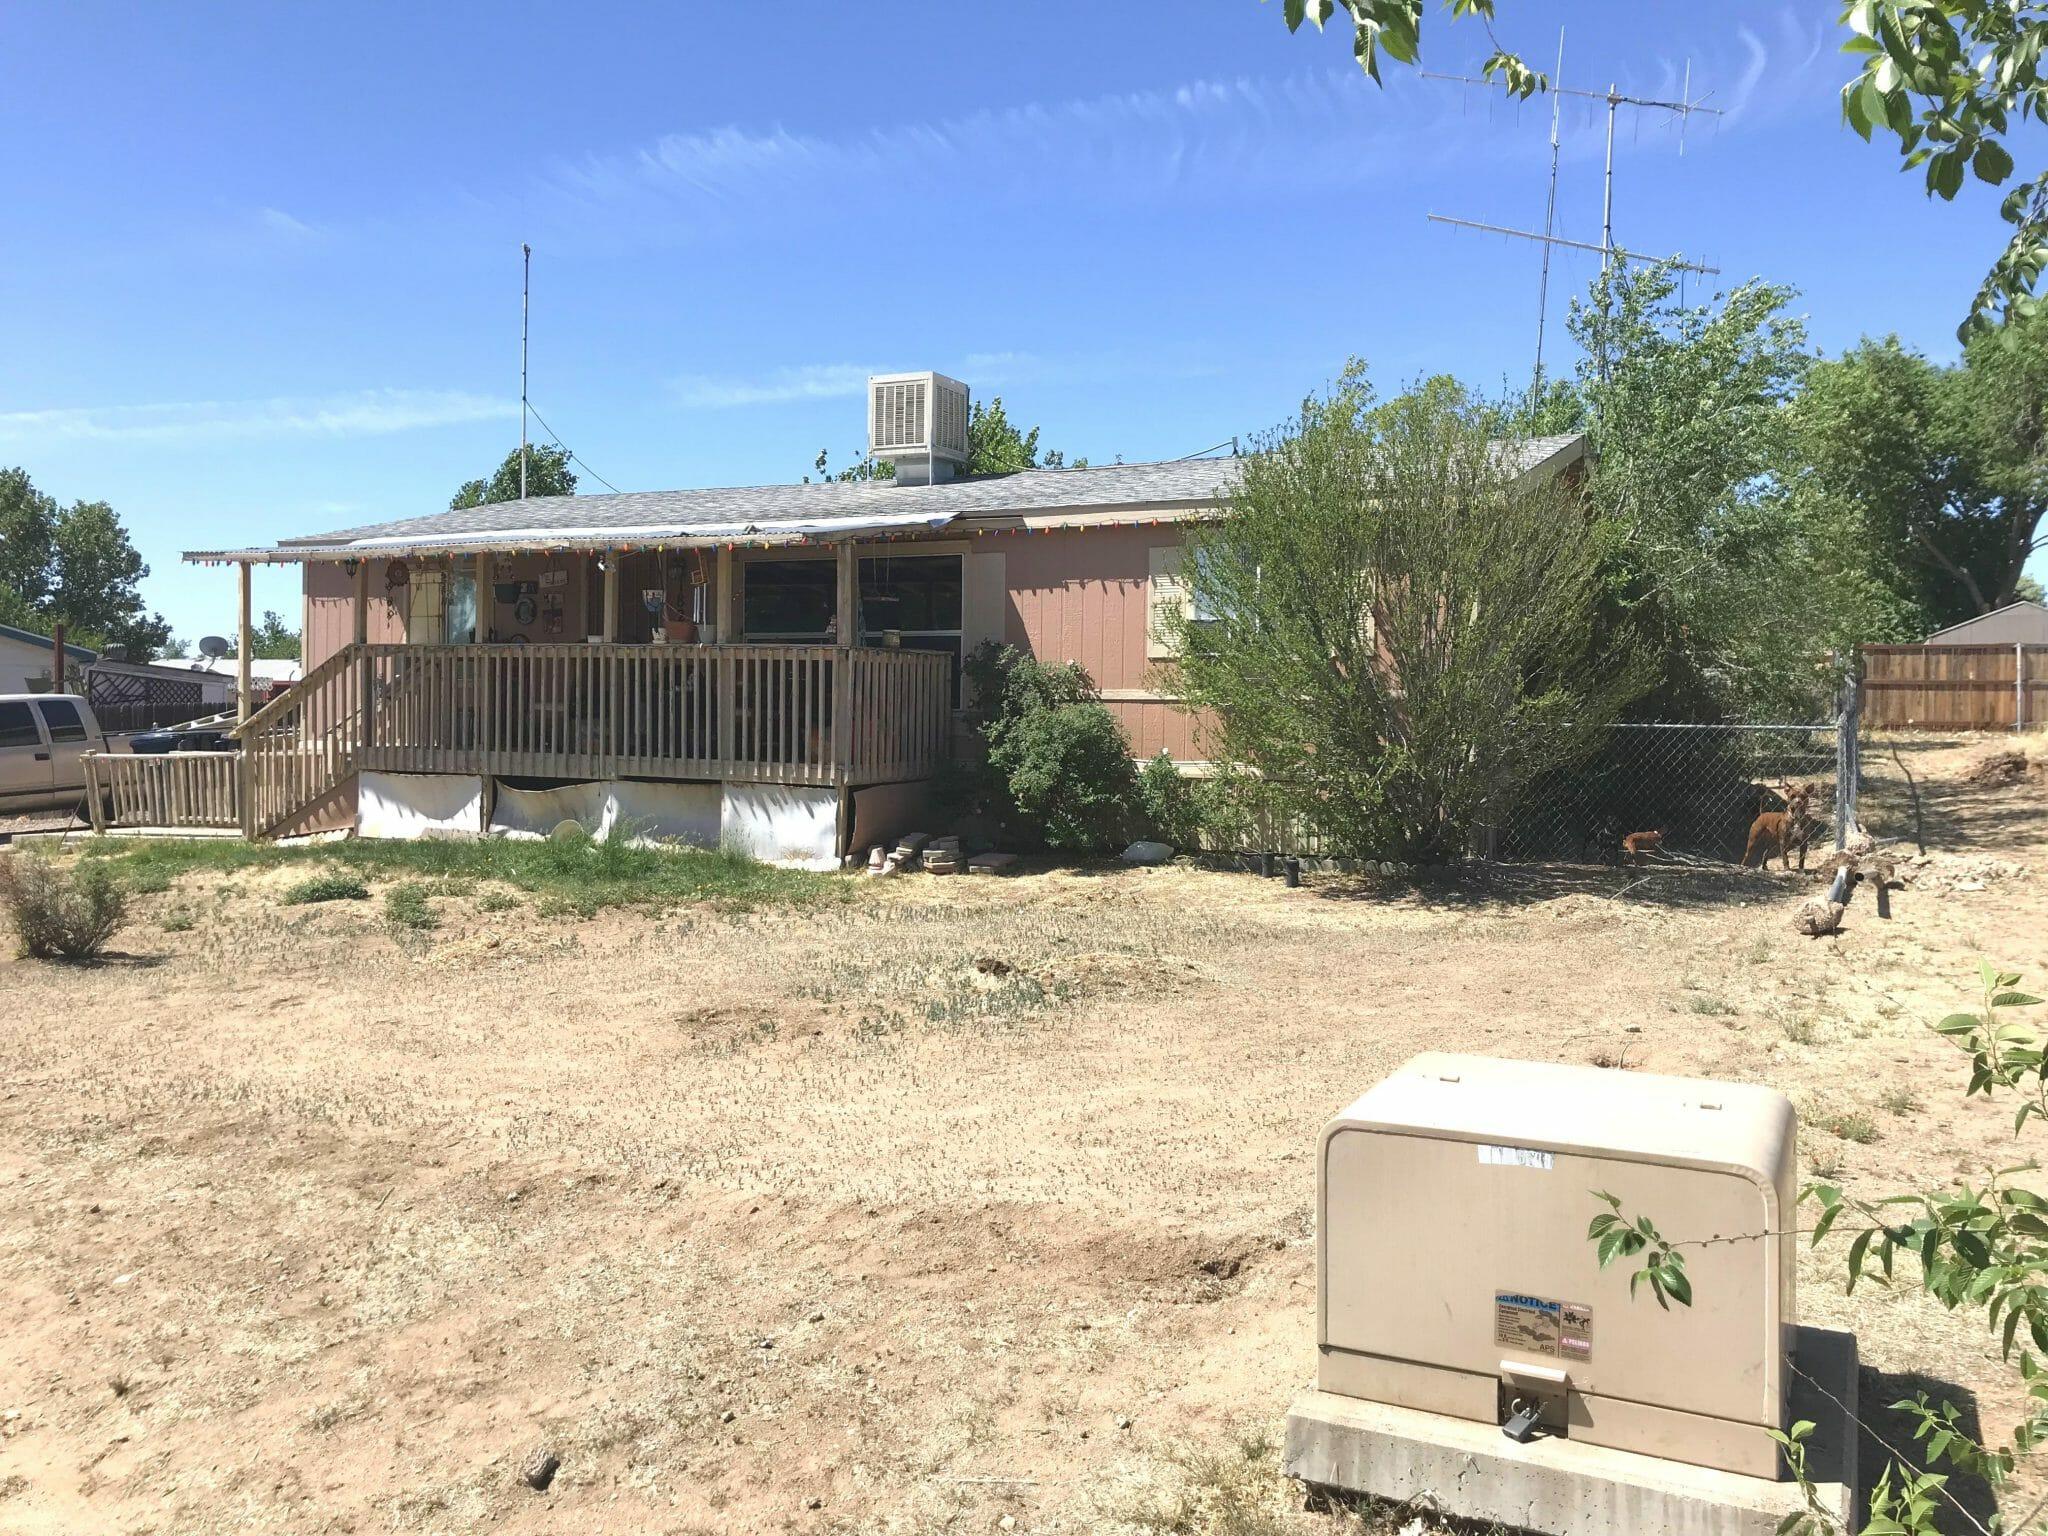 1825 Roadrunner Ln, Chino Valley, AZ 86323